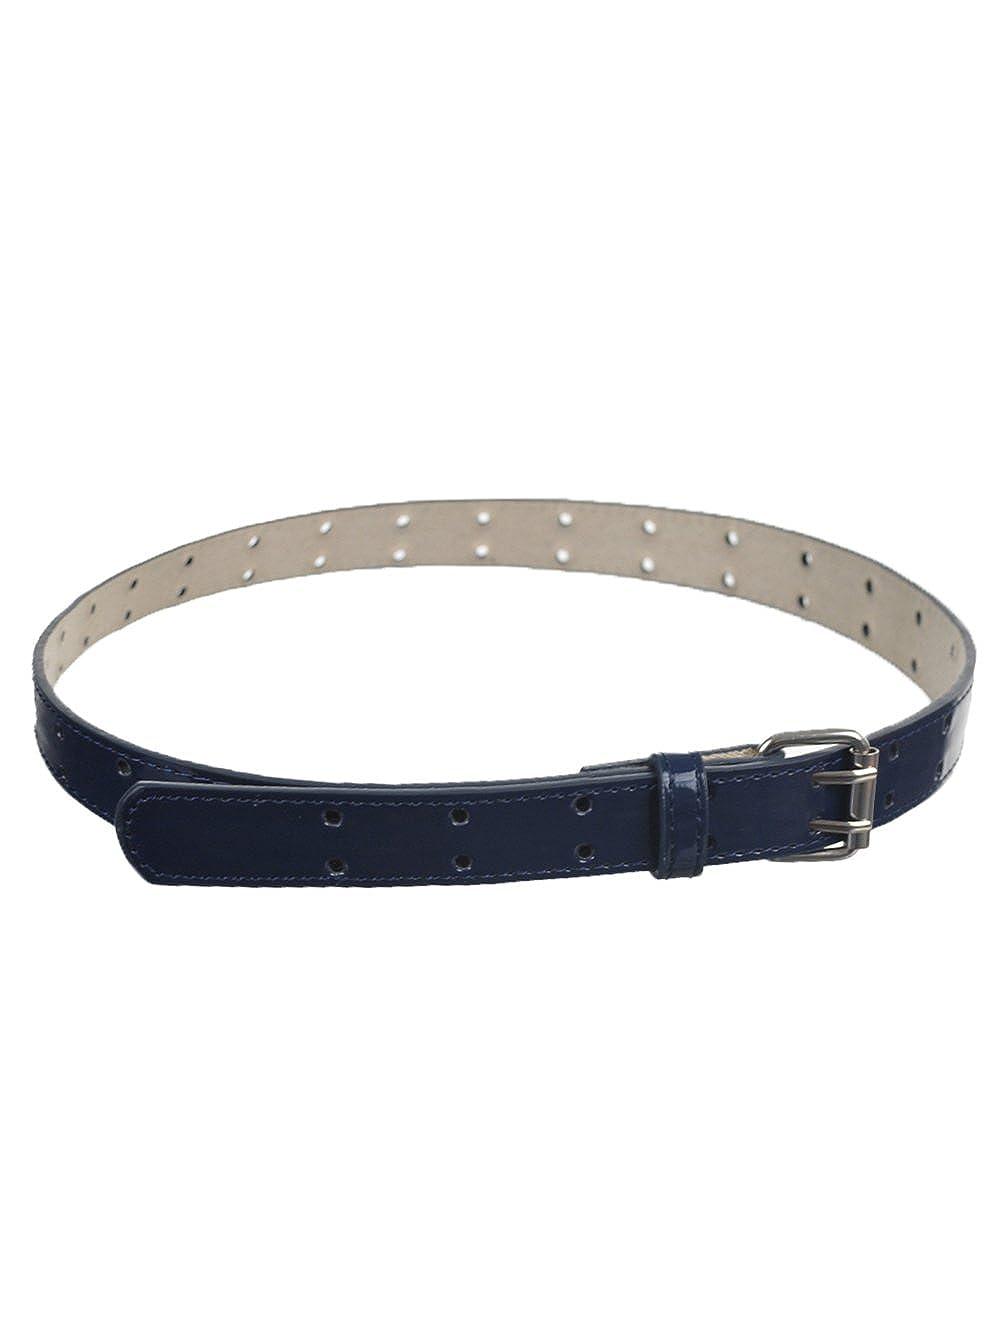 Cookie's Brand'Lansdowne' Genuine Leather Belt Cookie' s Brand